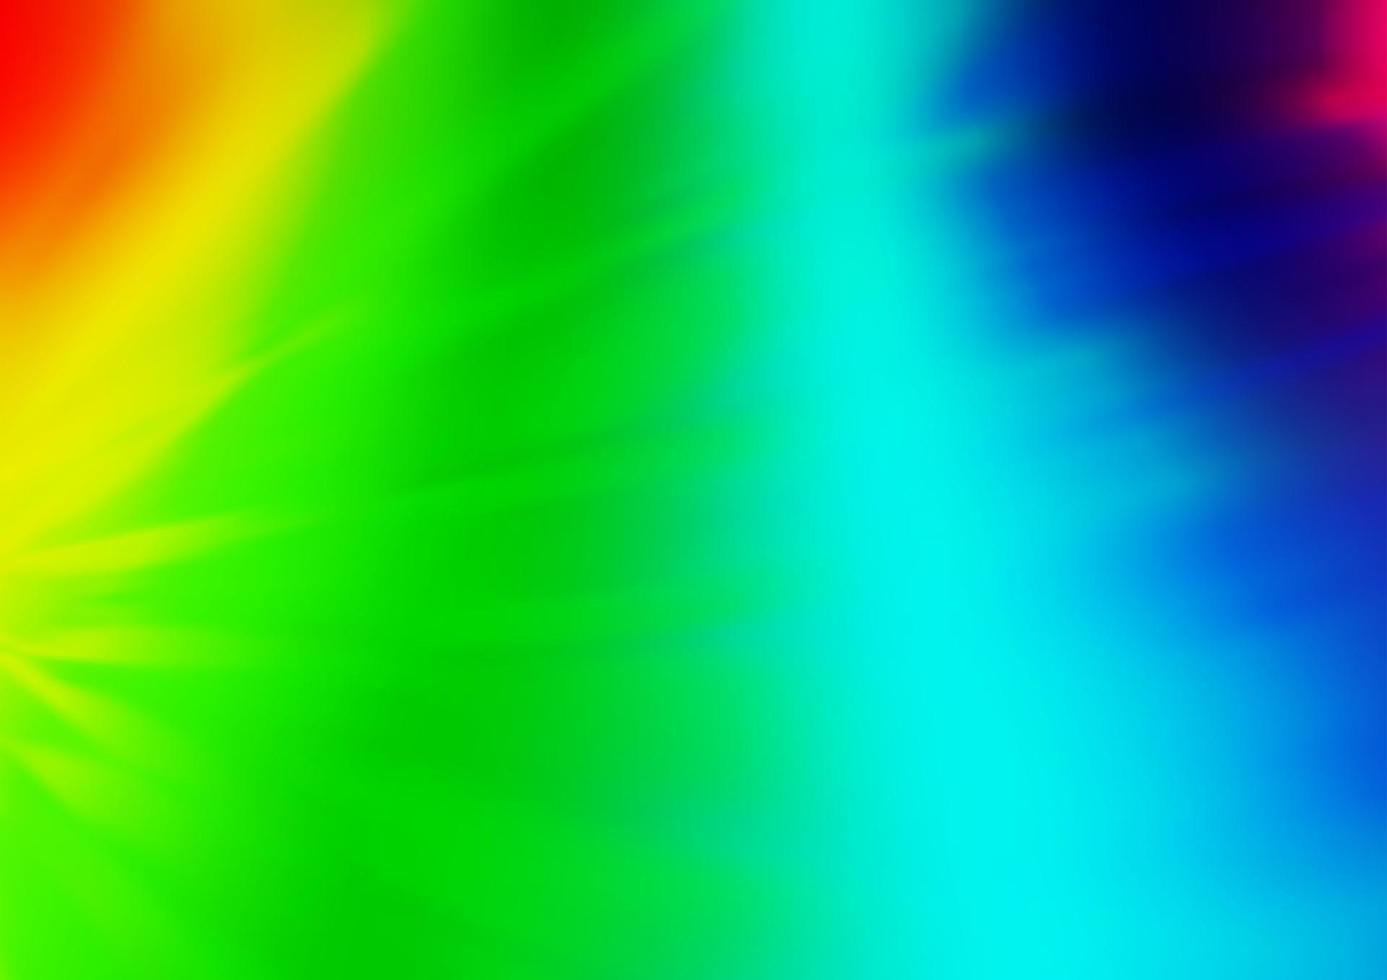 luz multicolor, arco-íris vetor abstrato turva padrão.